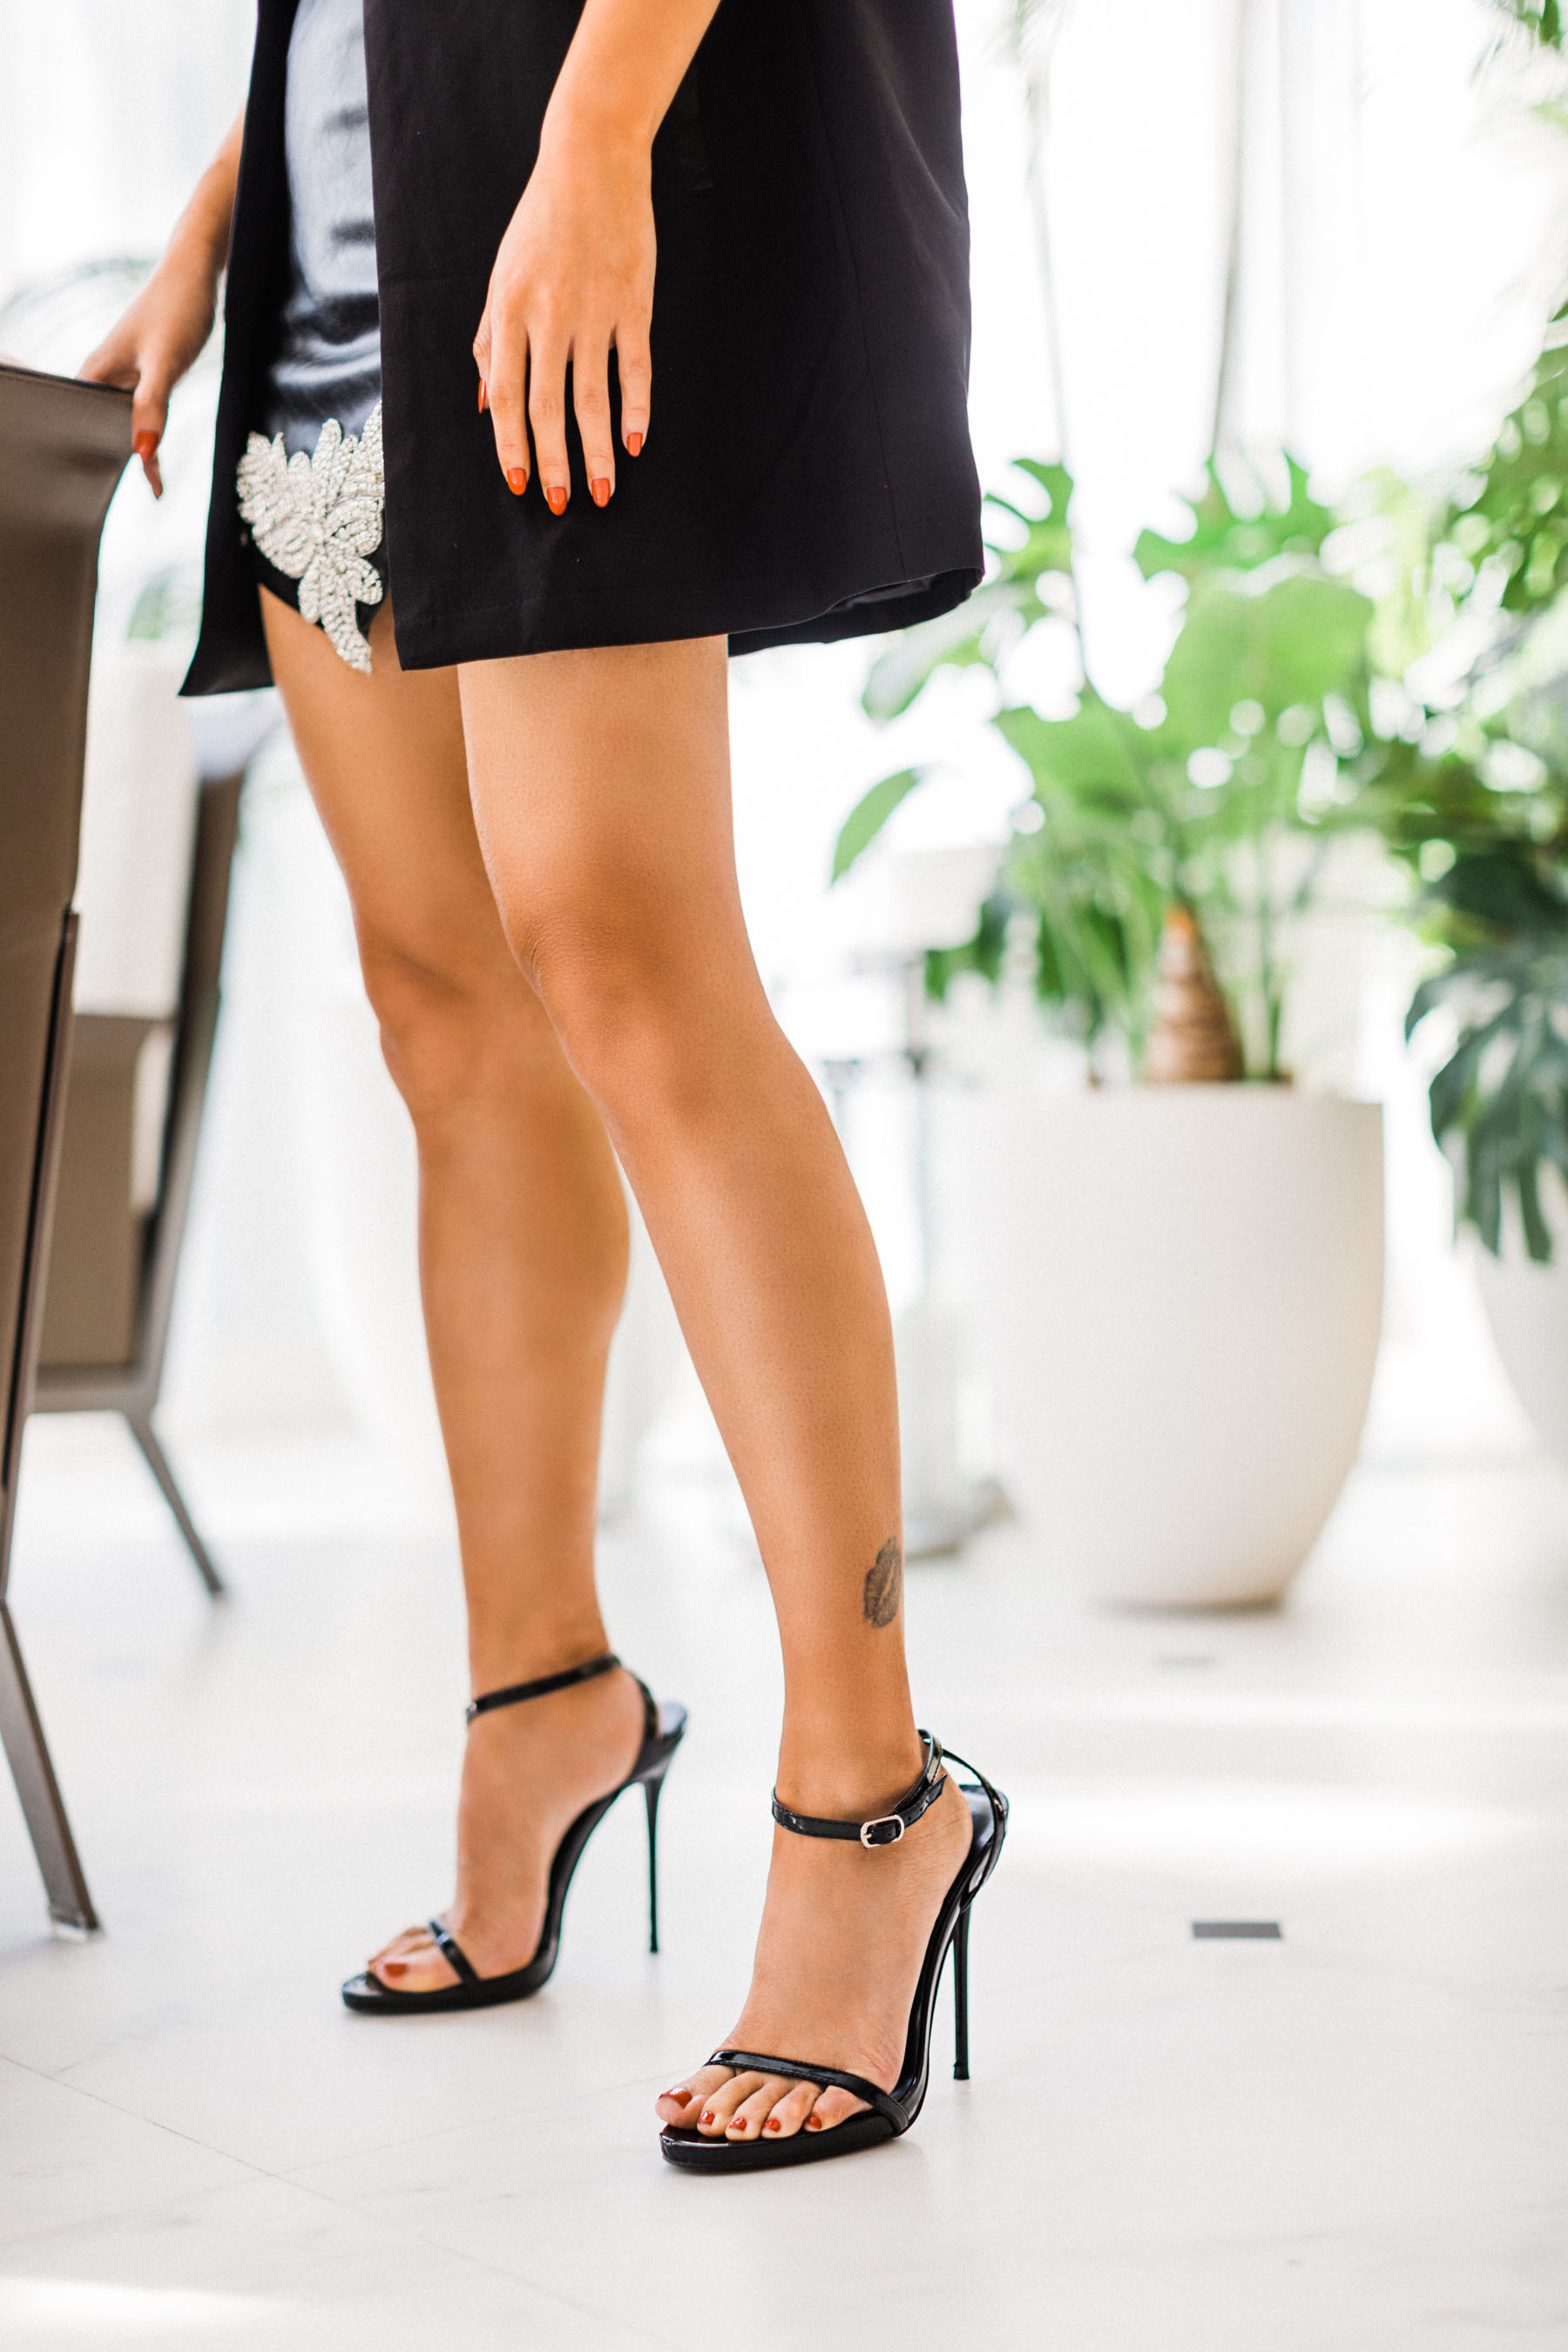 Black Simple Ankle Strap Heels // Notjessfashion.com